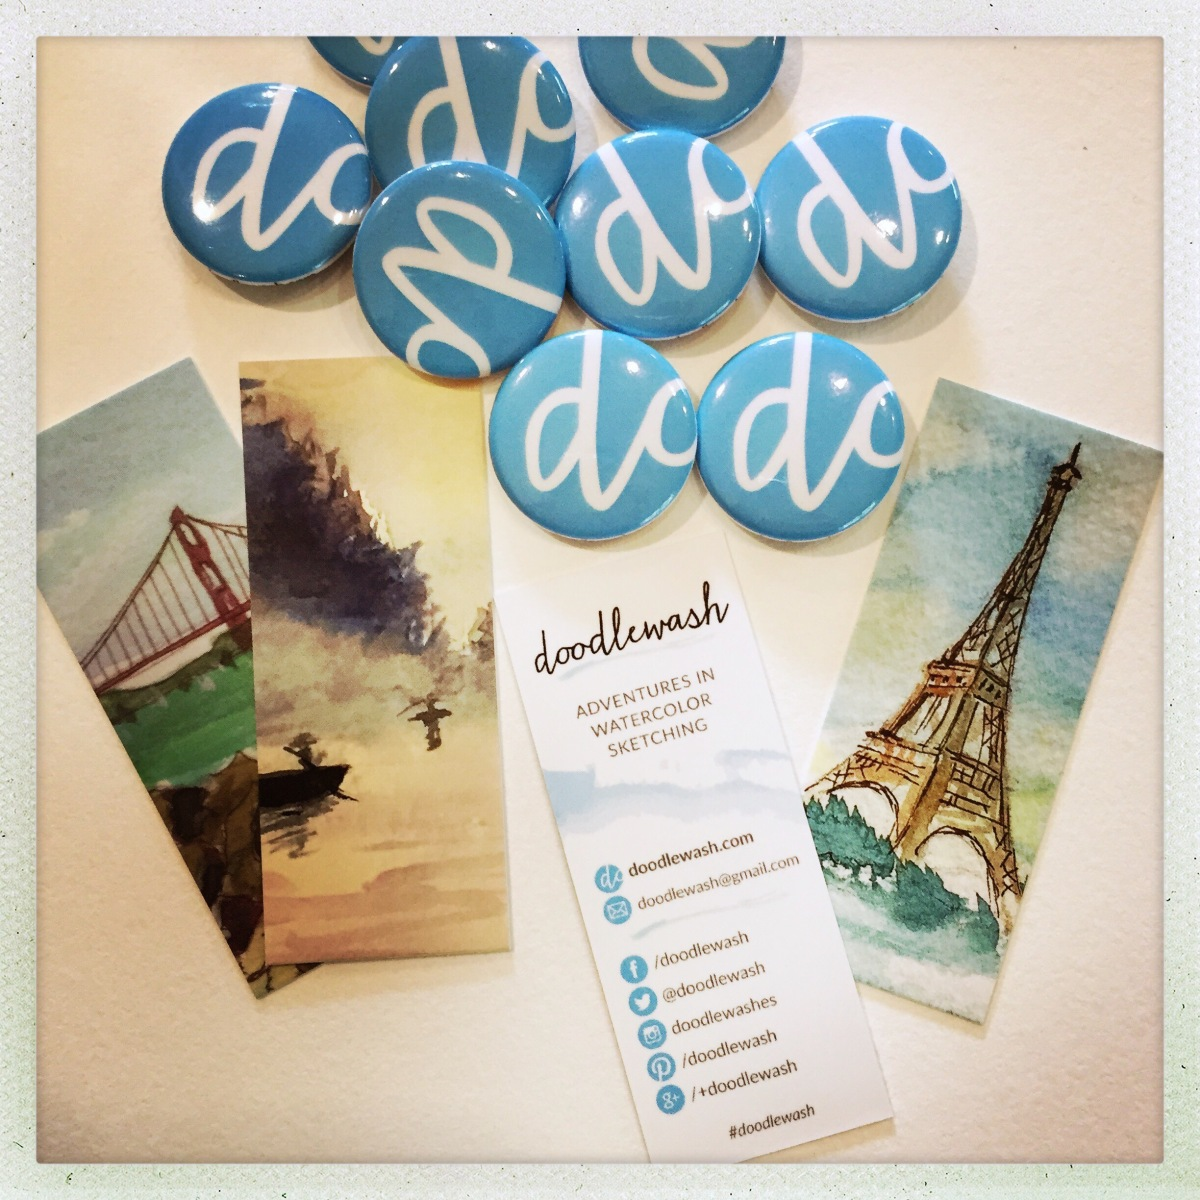 Doodlewash Cards & Buttons